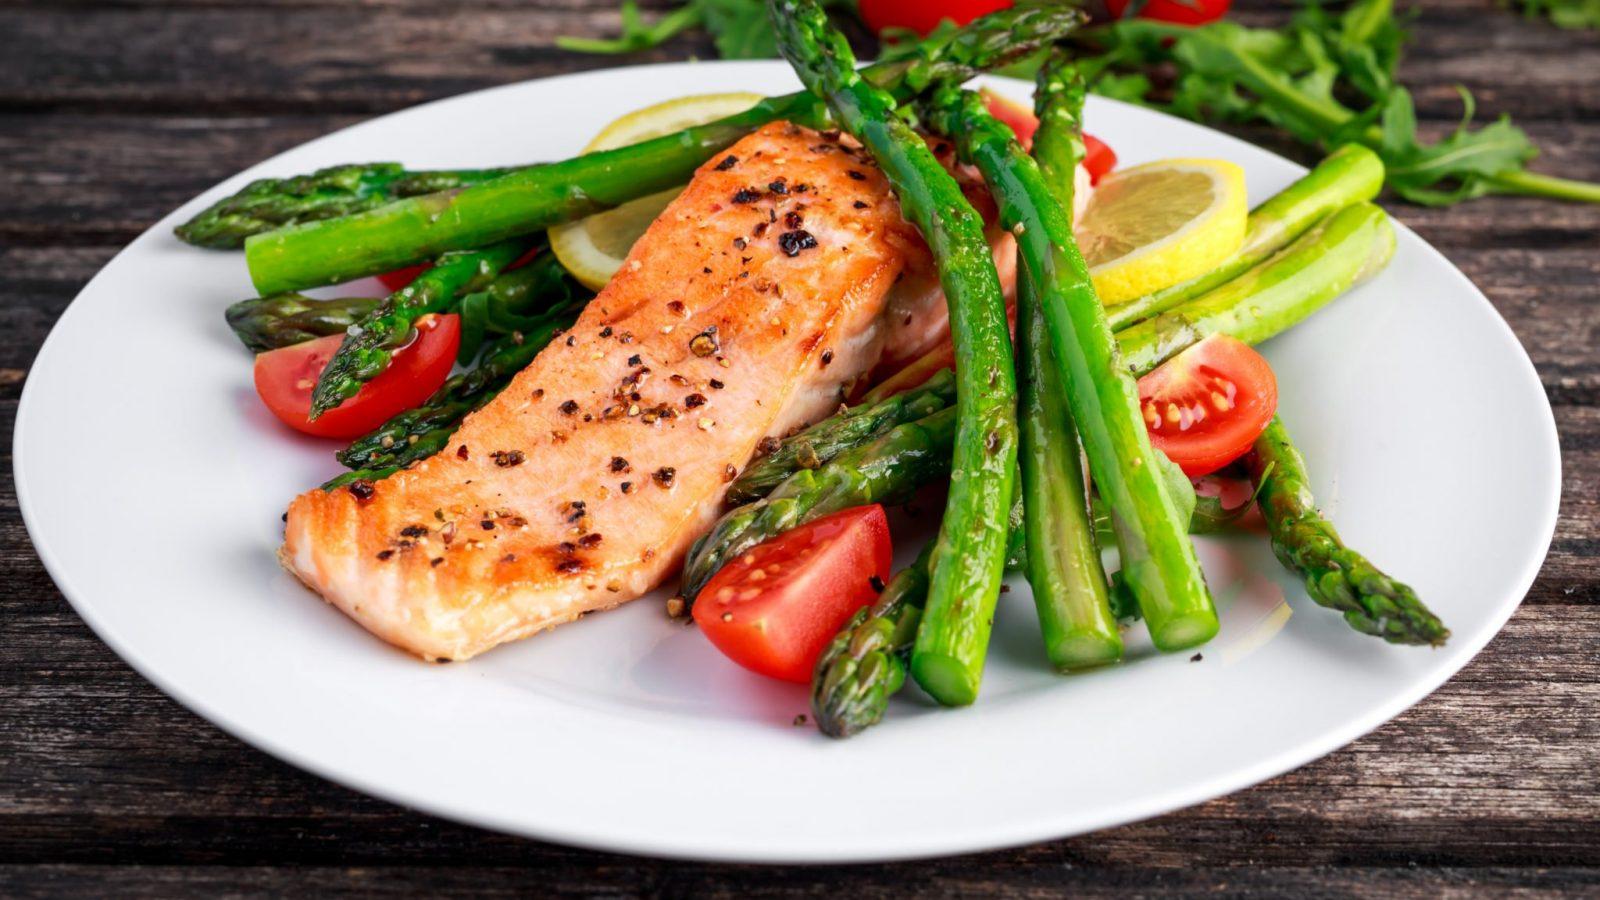 \Salmon with asparagus, tomatoes, lemon